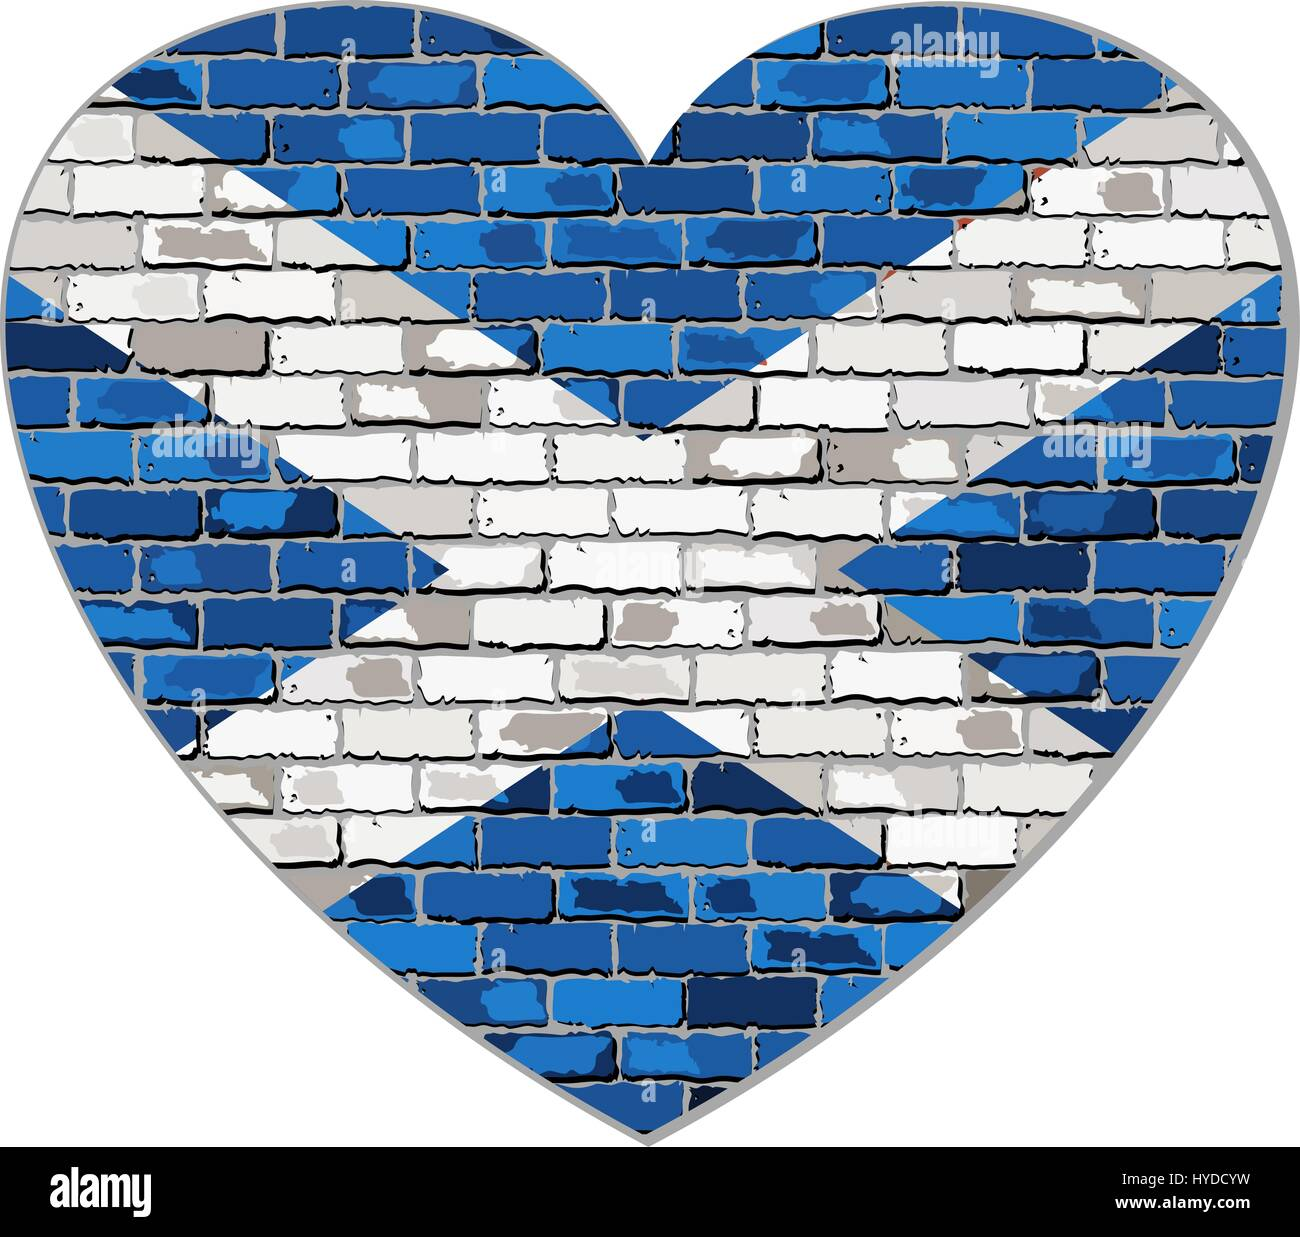 scotland flag on a brick wall in heart shape illustration